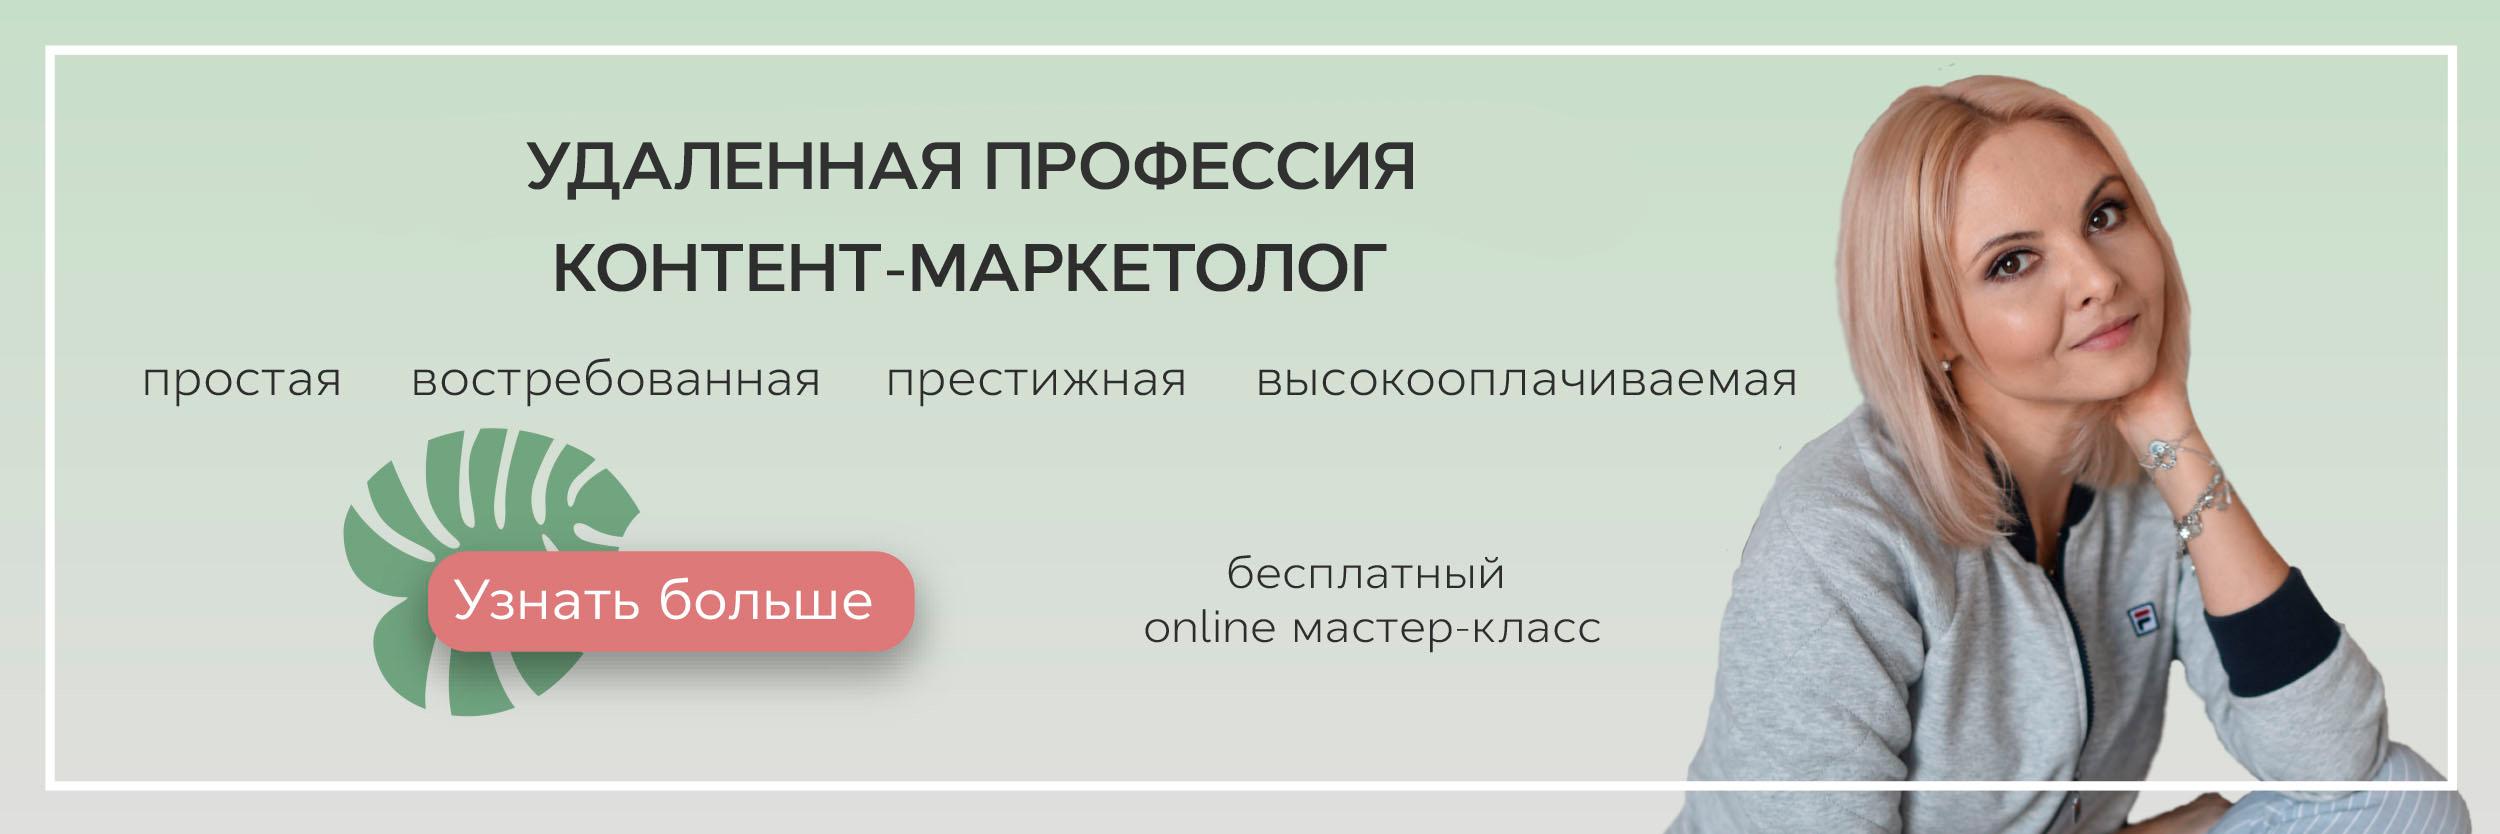 Мастер-класс по профессии контент маркетолог